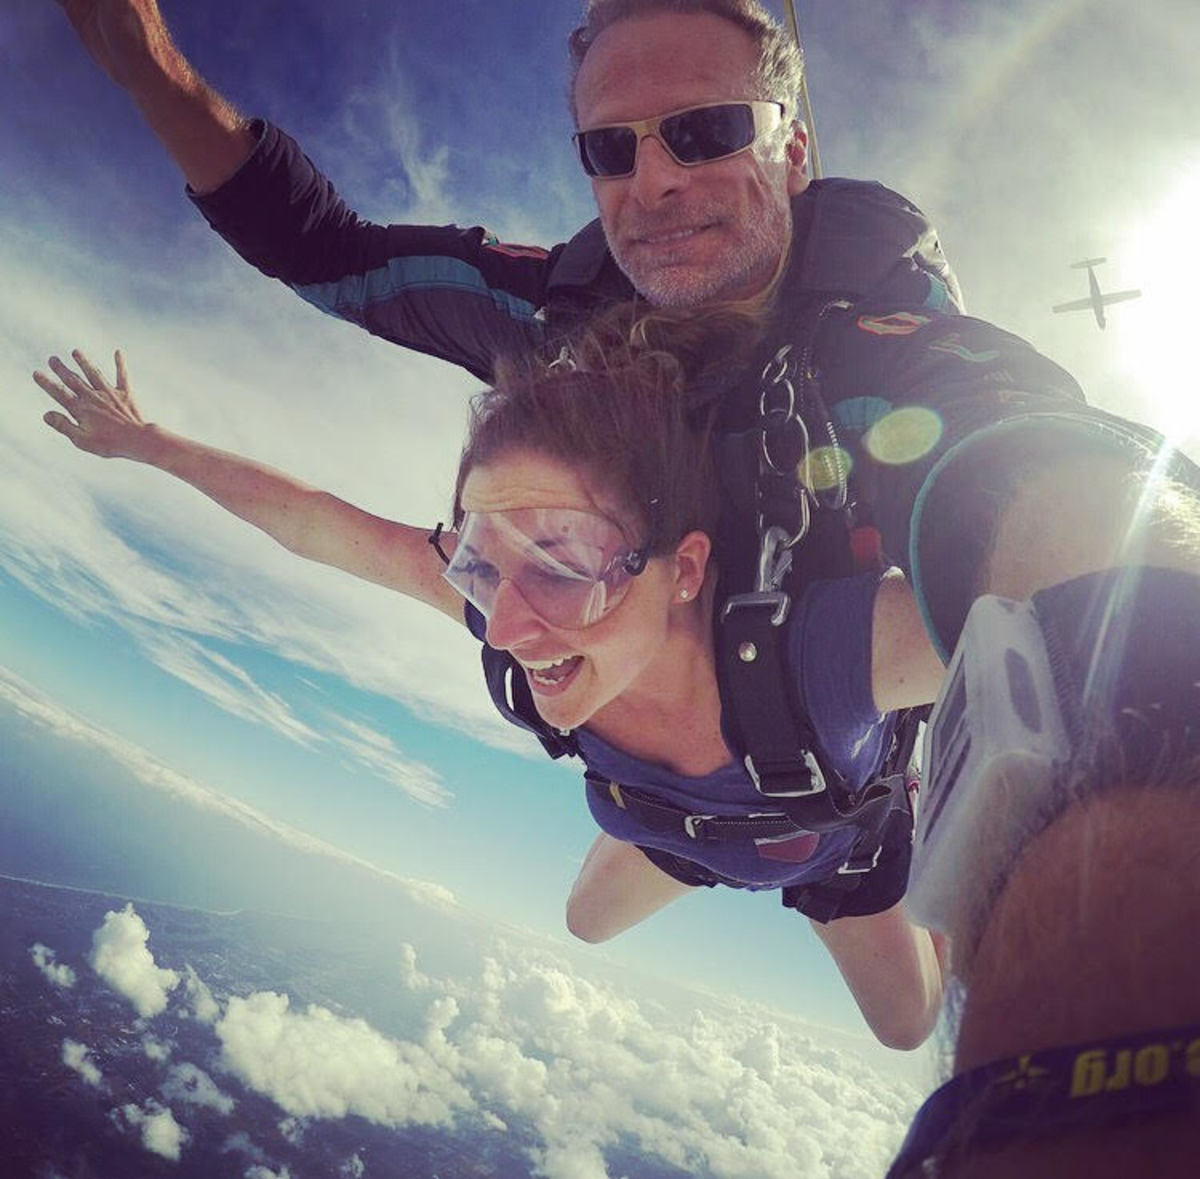 Skydiving in Sebastian, FL